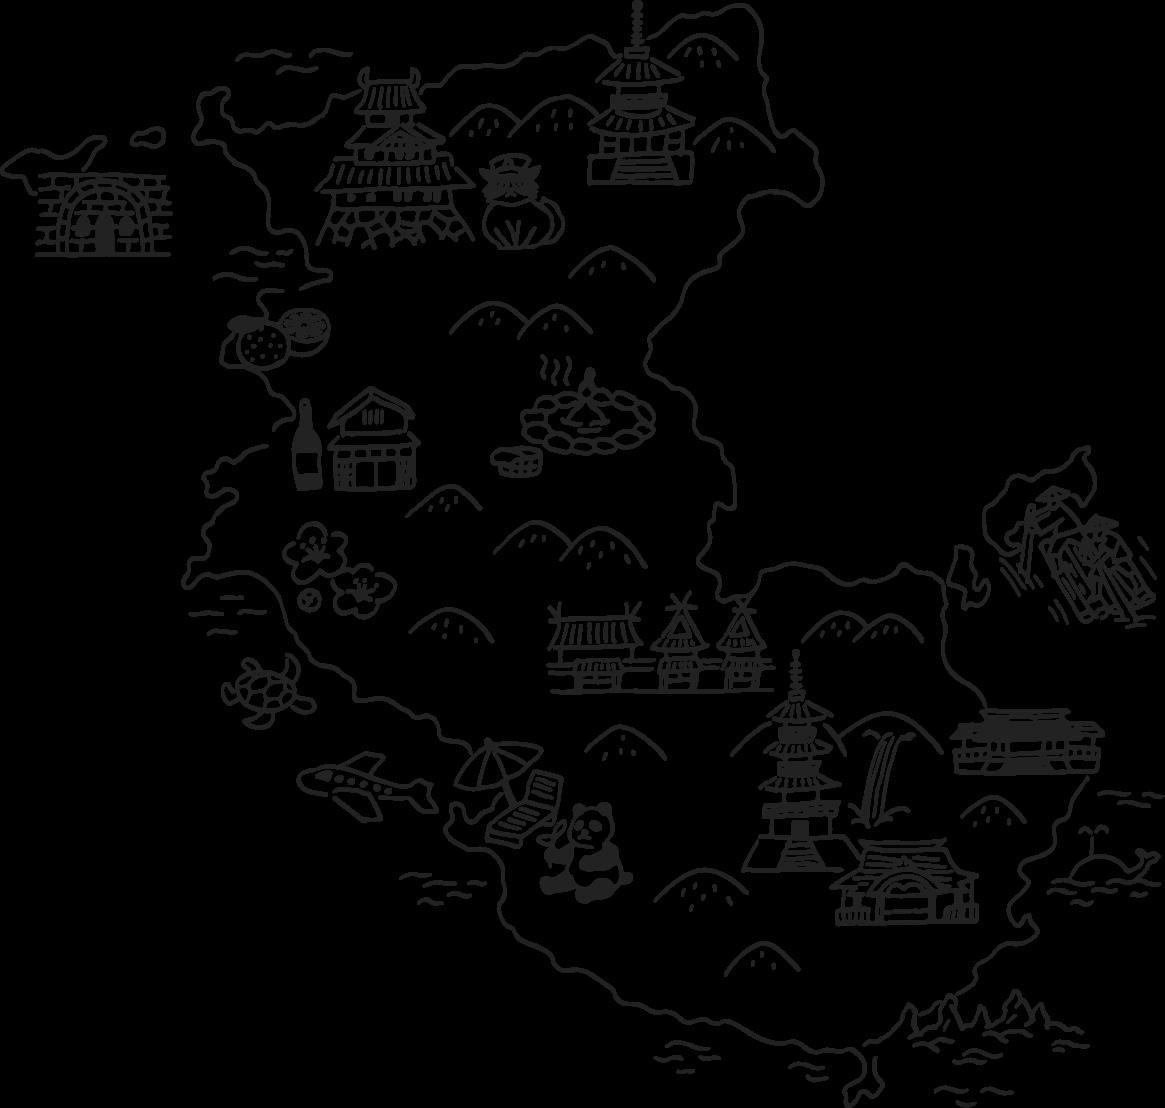 和歌山県MAP